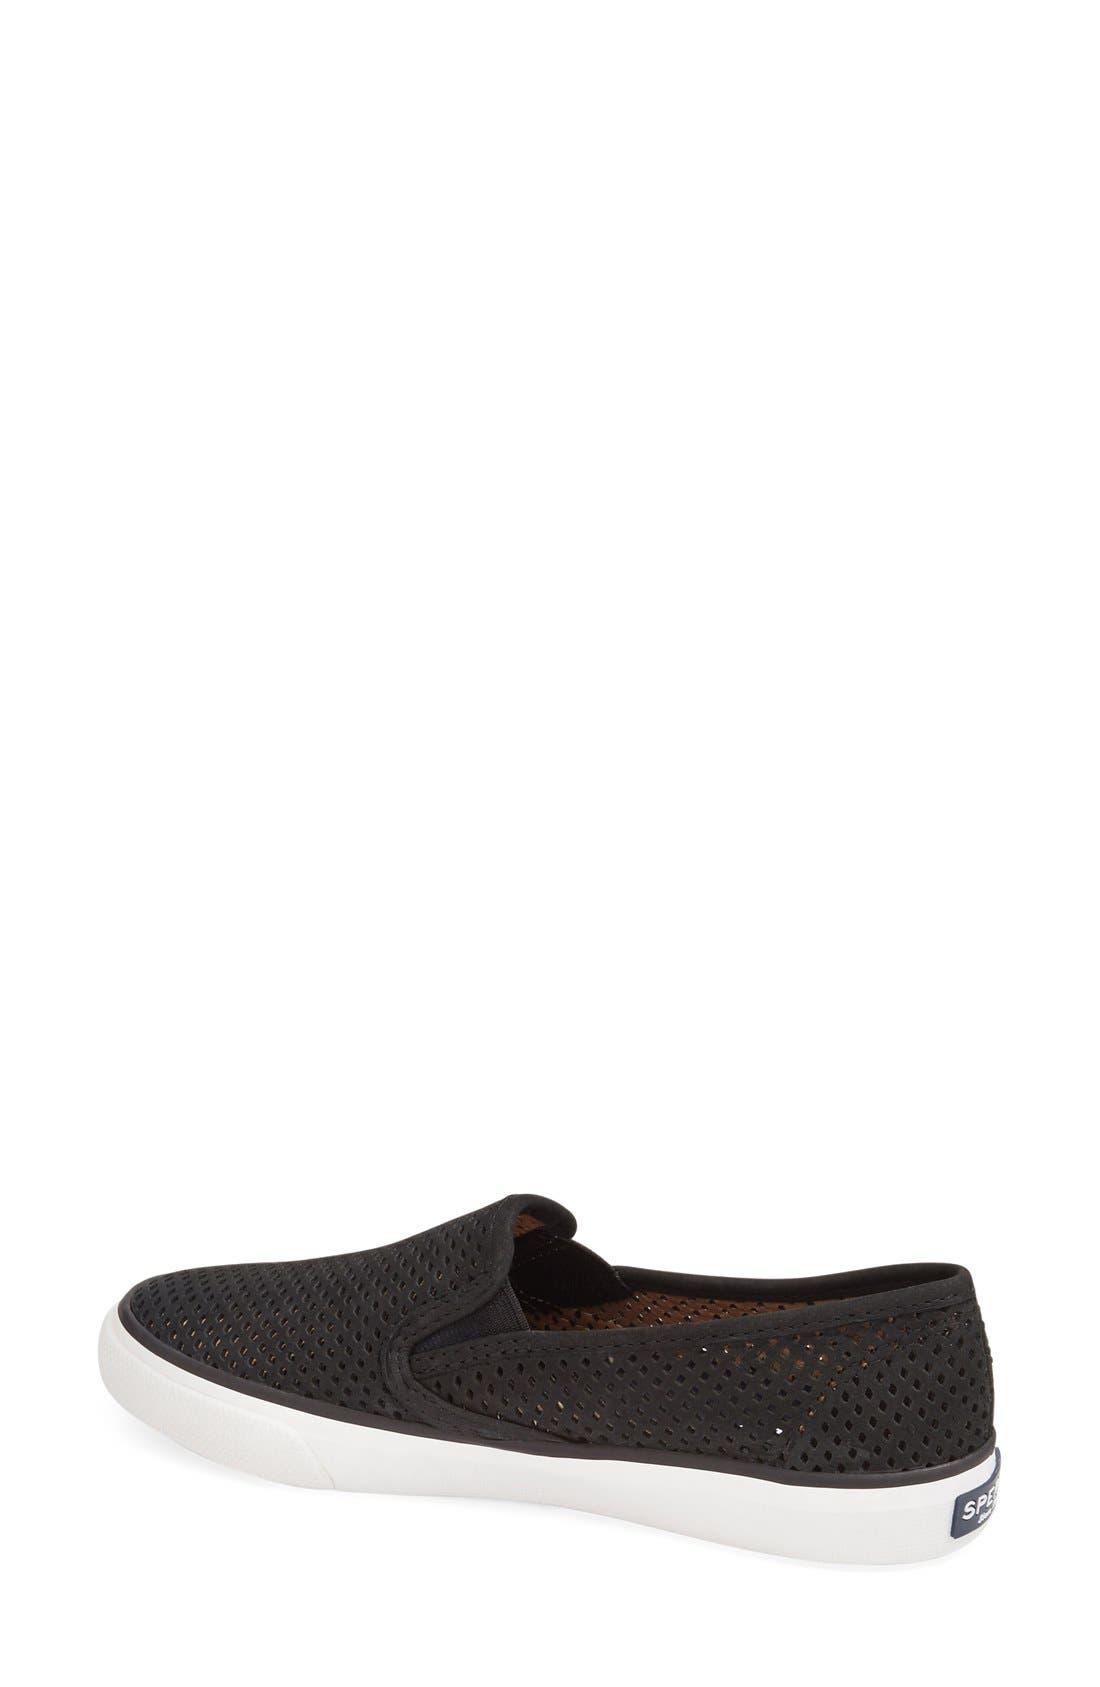 Alternate Image 2  - Sperry 'Seaside' Perforated Slip-On Sneaker (Women)